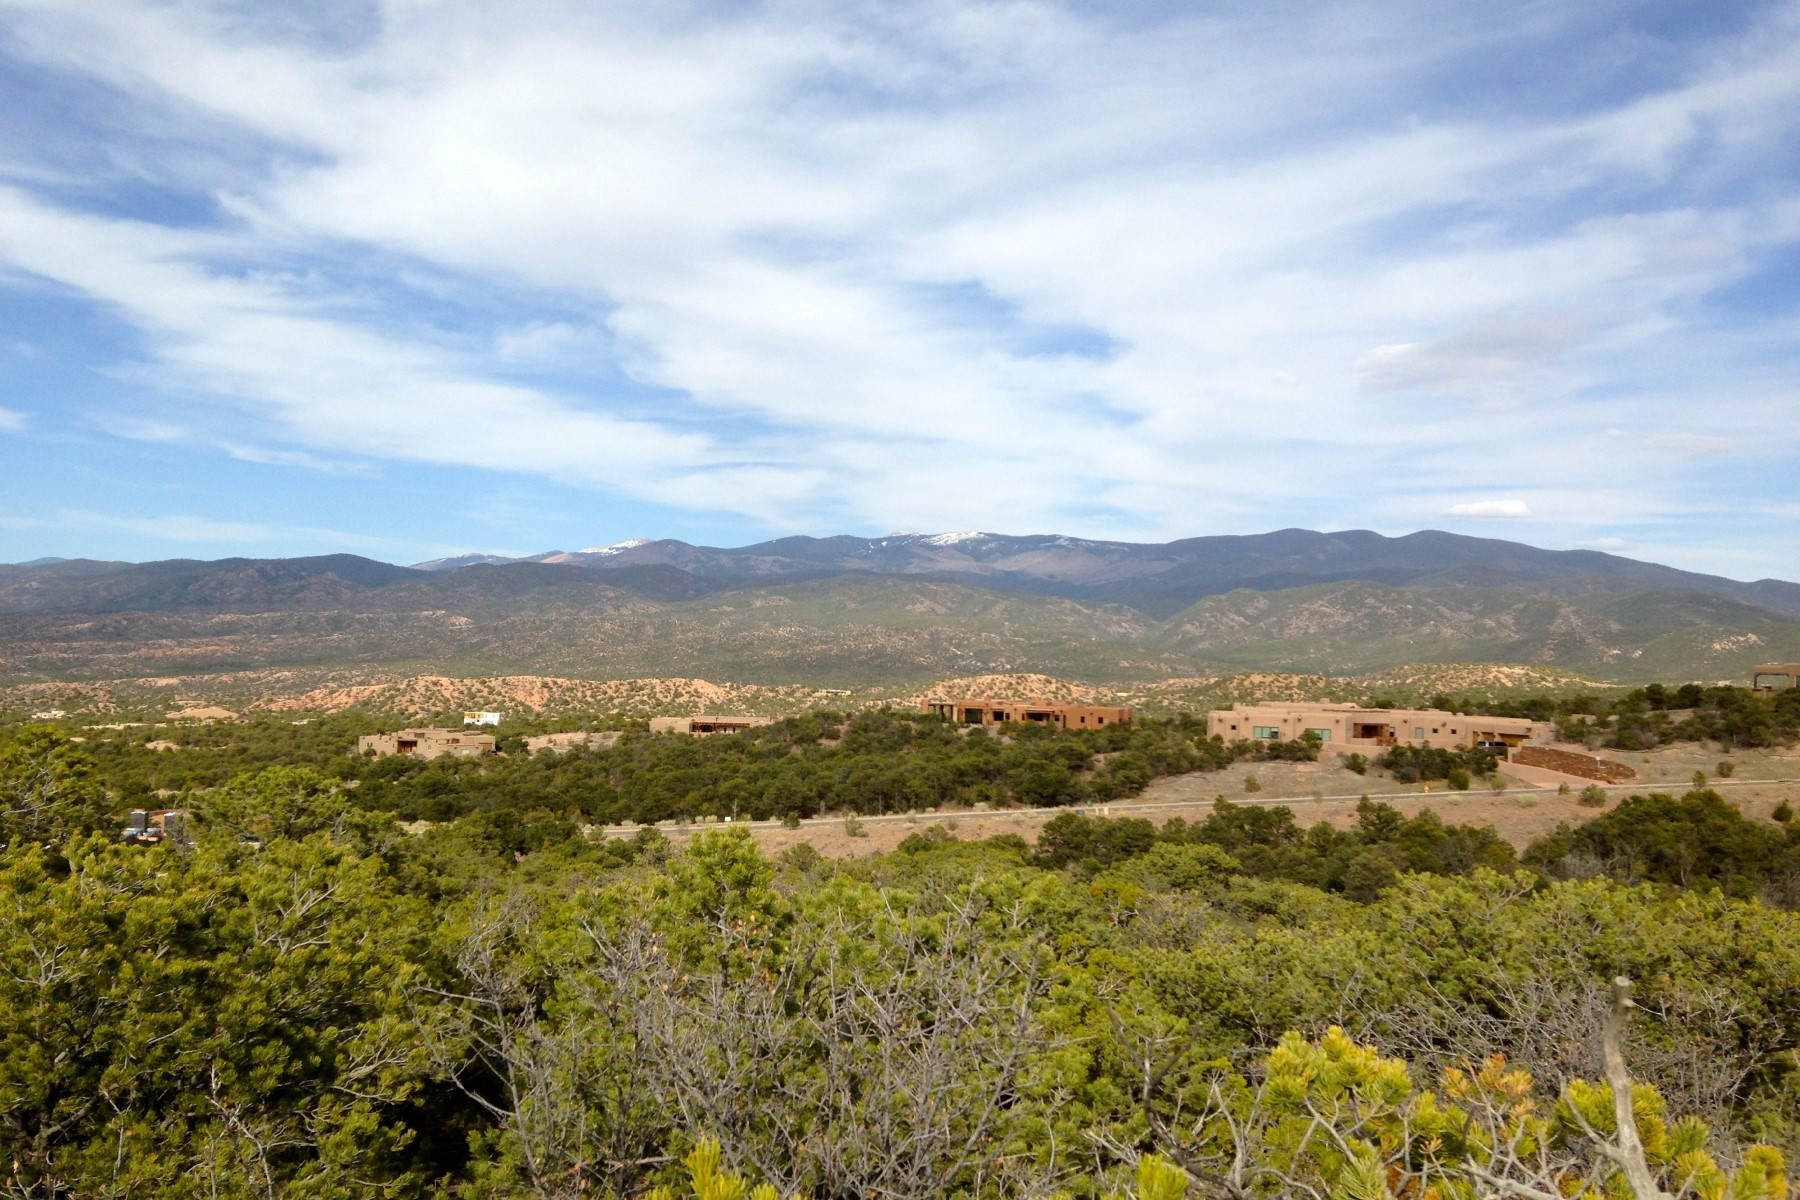 Land for Sale at 2979 Broken Sherd Trail - Lot 151A Monte Sereno, Santa Fe, New Mexico 87506 United States